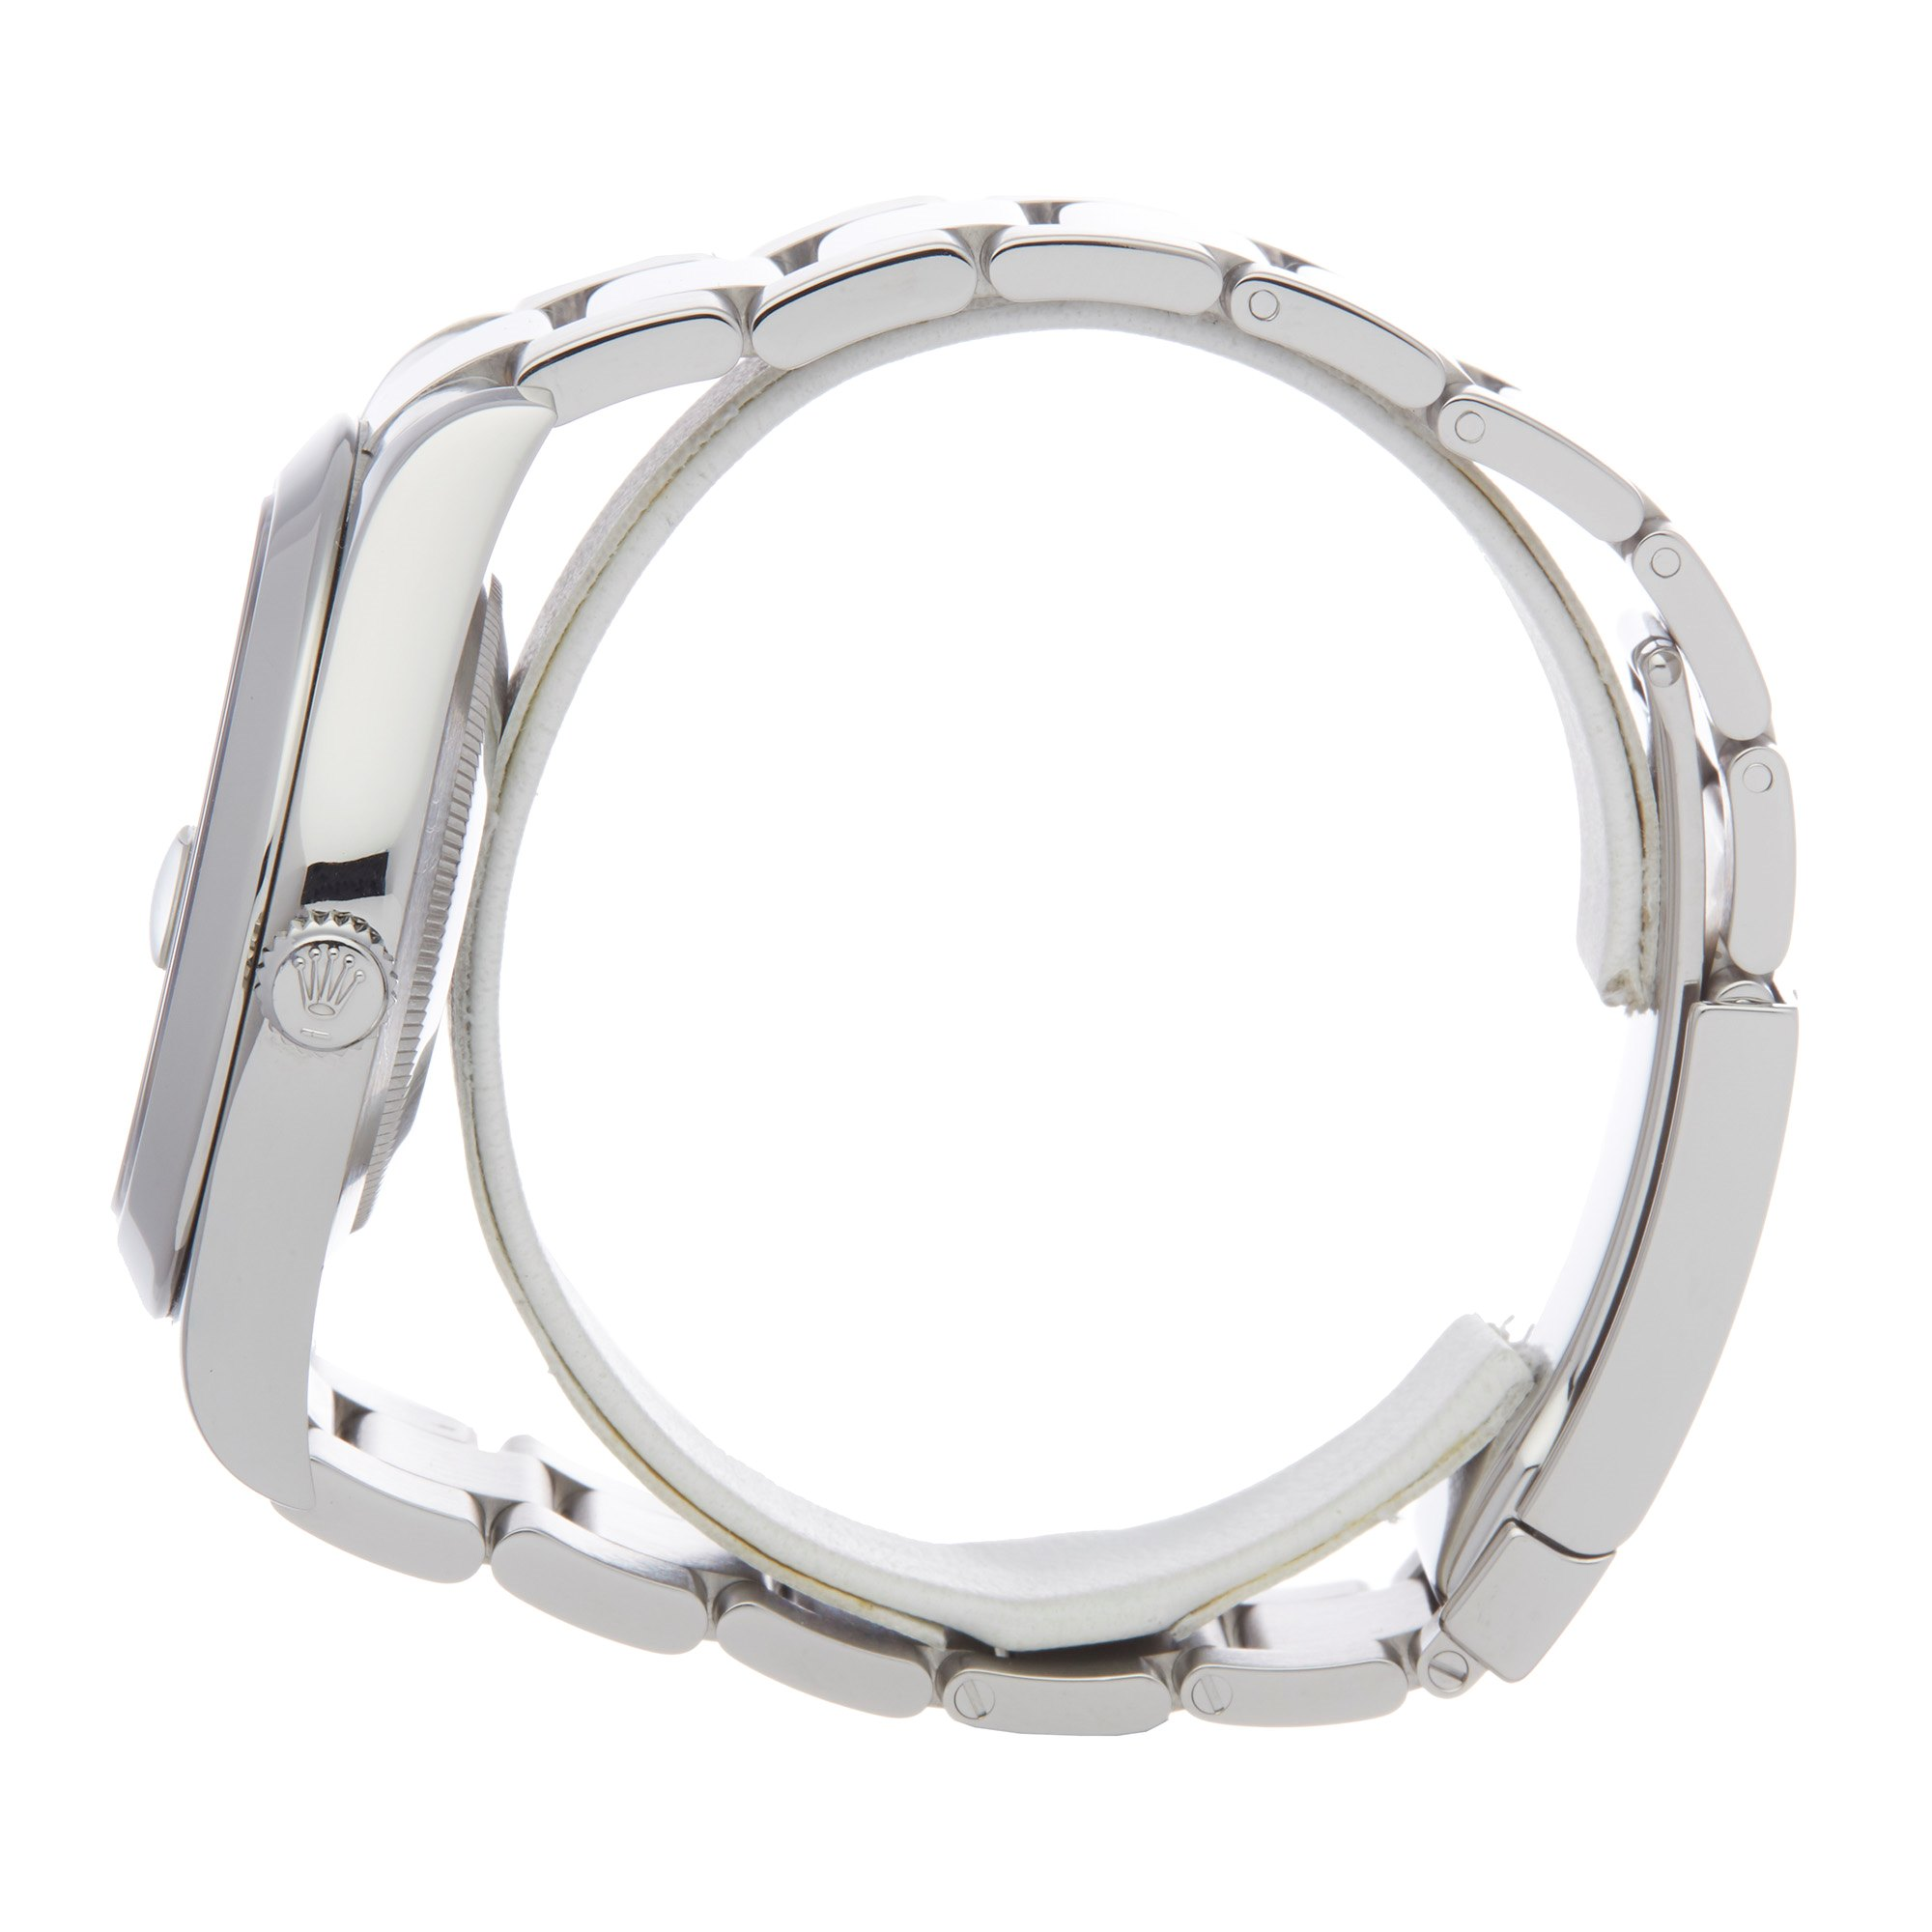 Rolex Datejust II Stainless Steel 116300